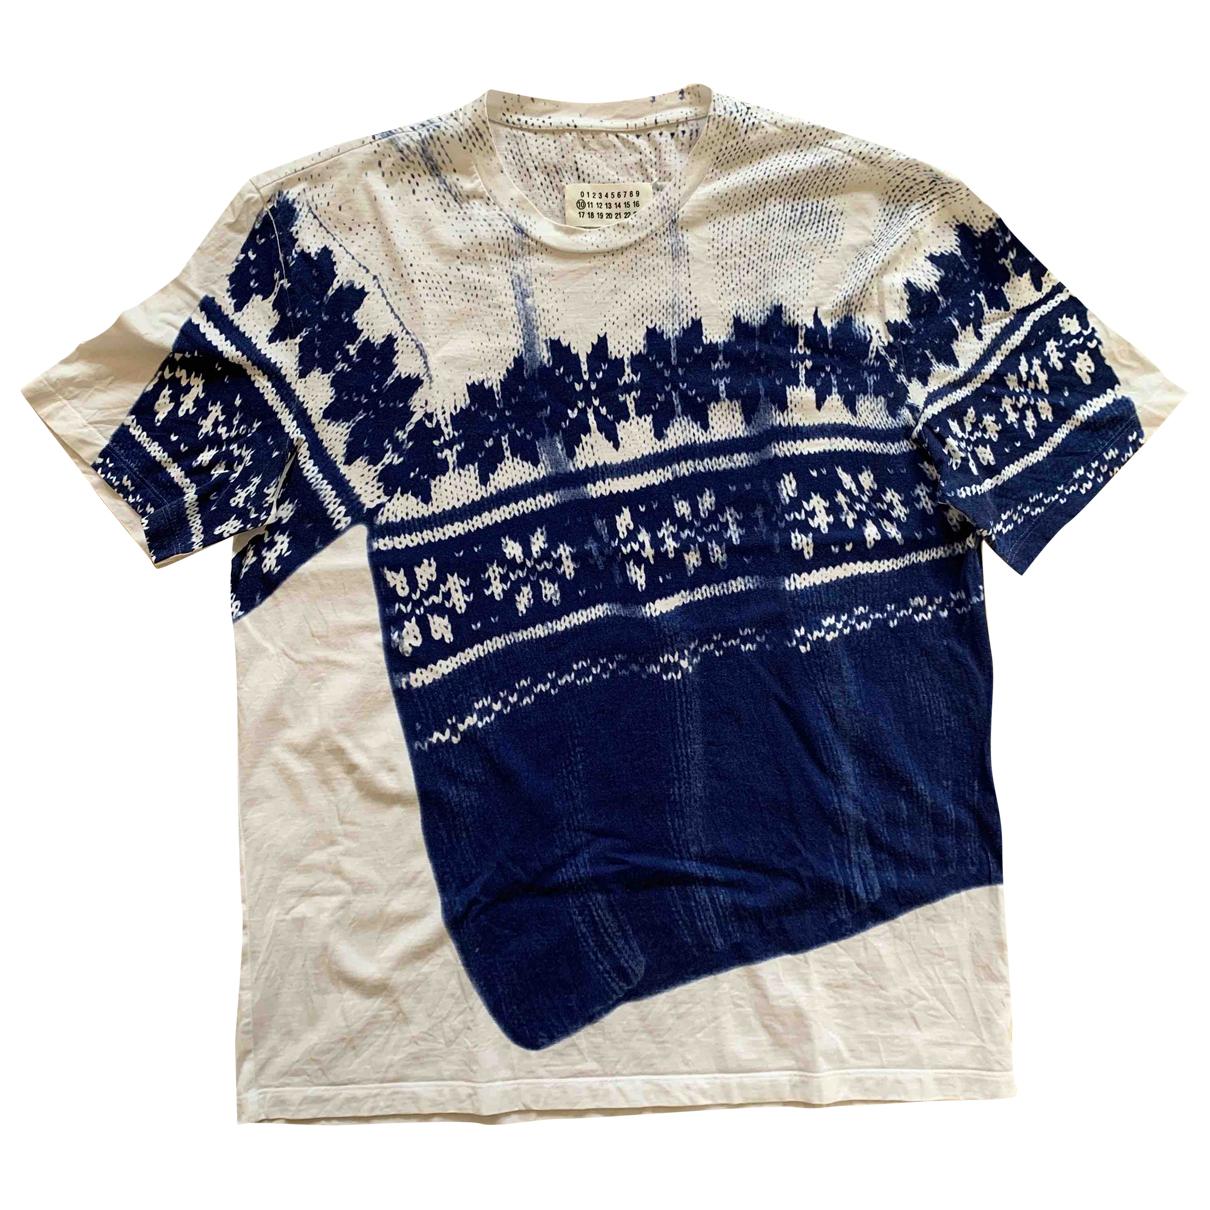 Maison Martin Margiela N White Cotton T-shirts for Men S International